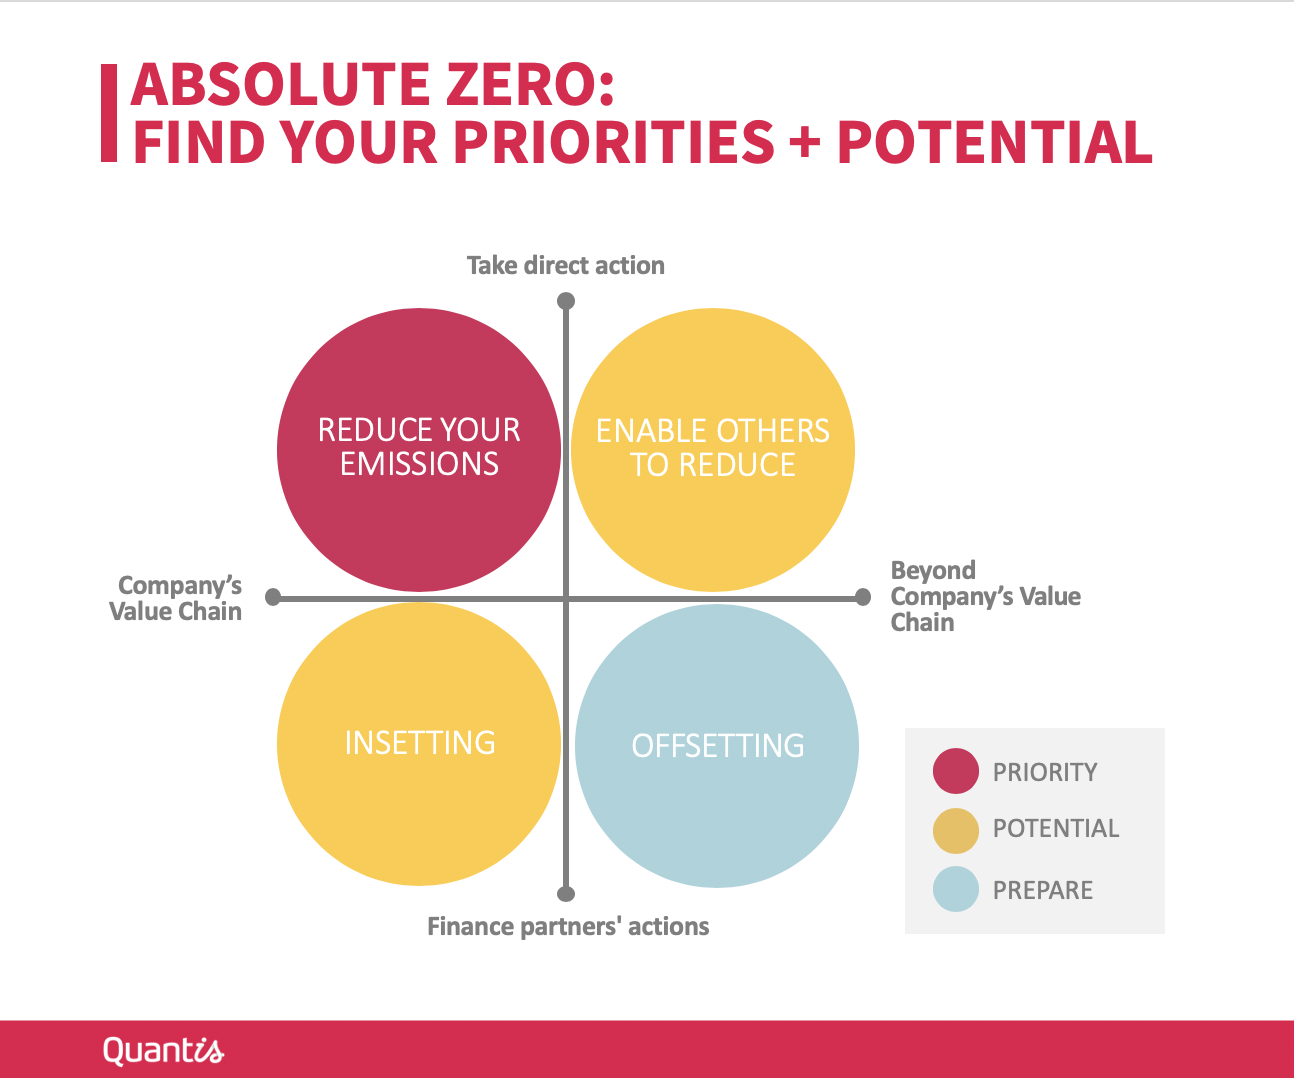 Absolute Zero chart